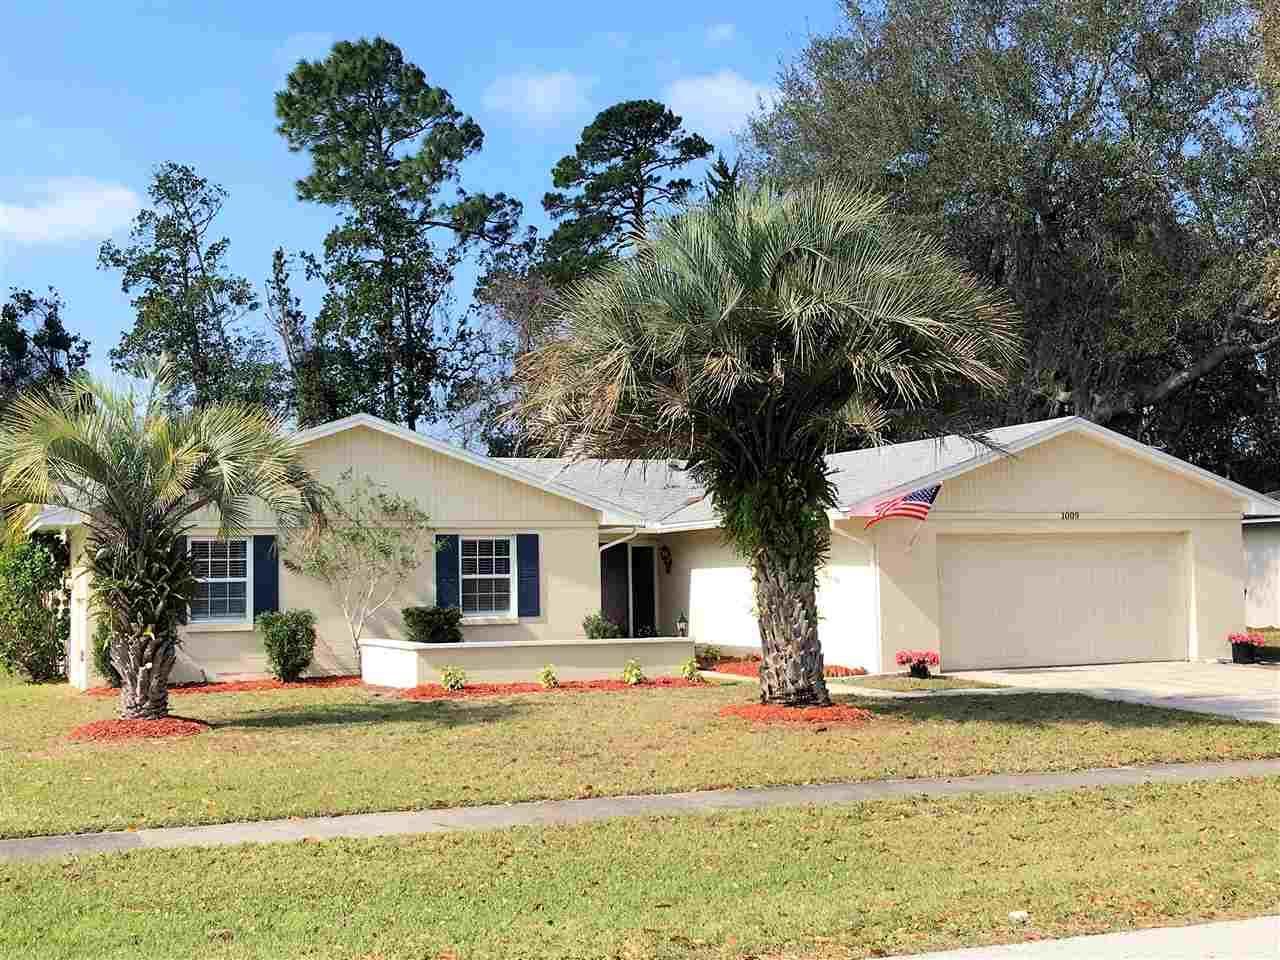 1009 Espinado Ave, St Augustine, FL 32086 (MLS #168430) :: St. Augustine Realty